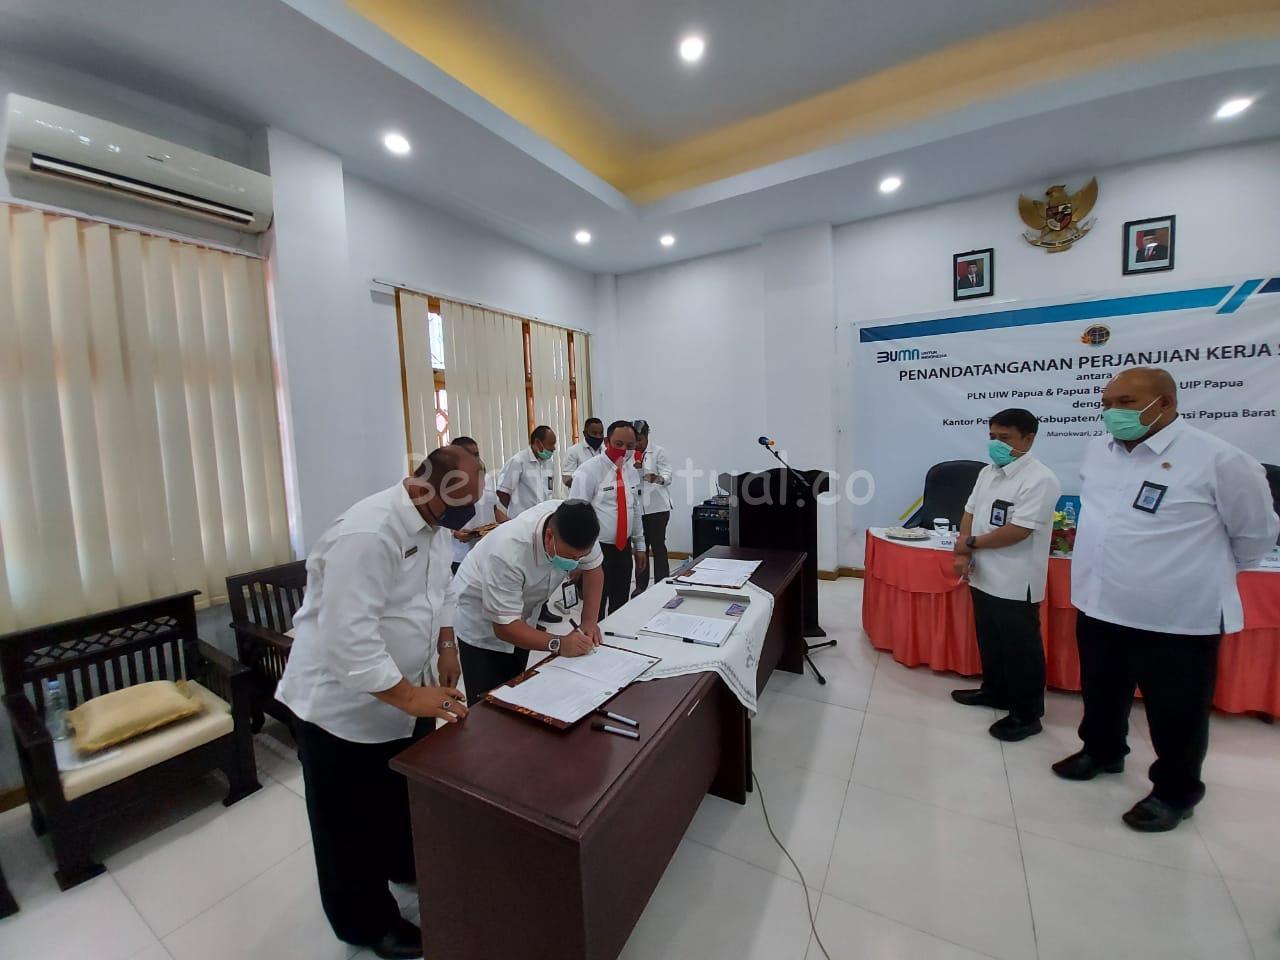 PLN Unit Papua Dan Papua Barat Teken MoU Bersama BPN Untuk Sertifikasi Tanah 17 IMG 20200722 WA0087